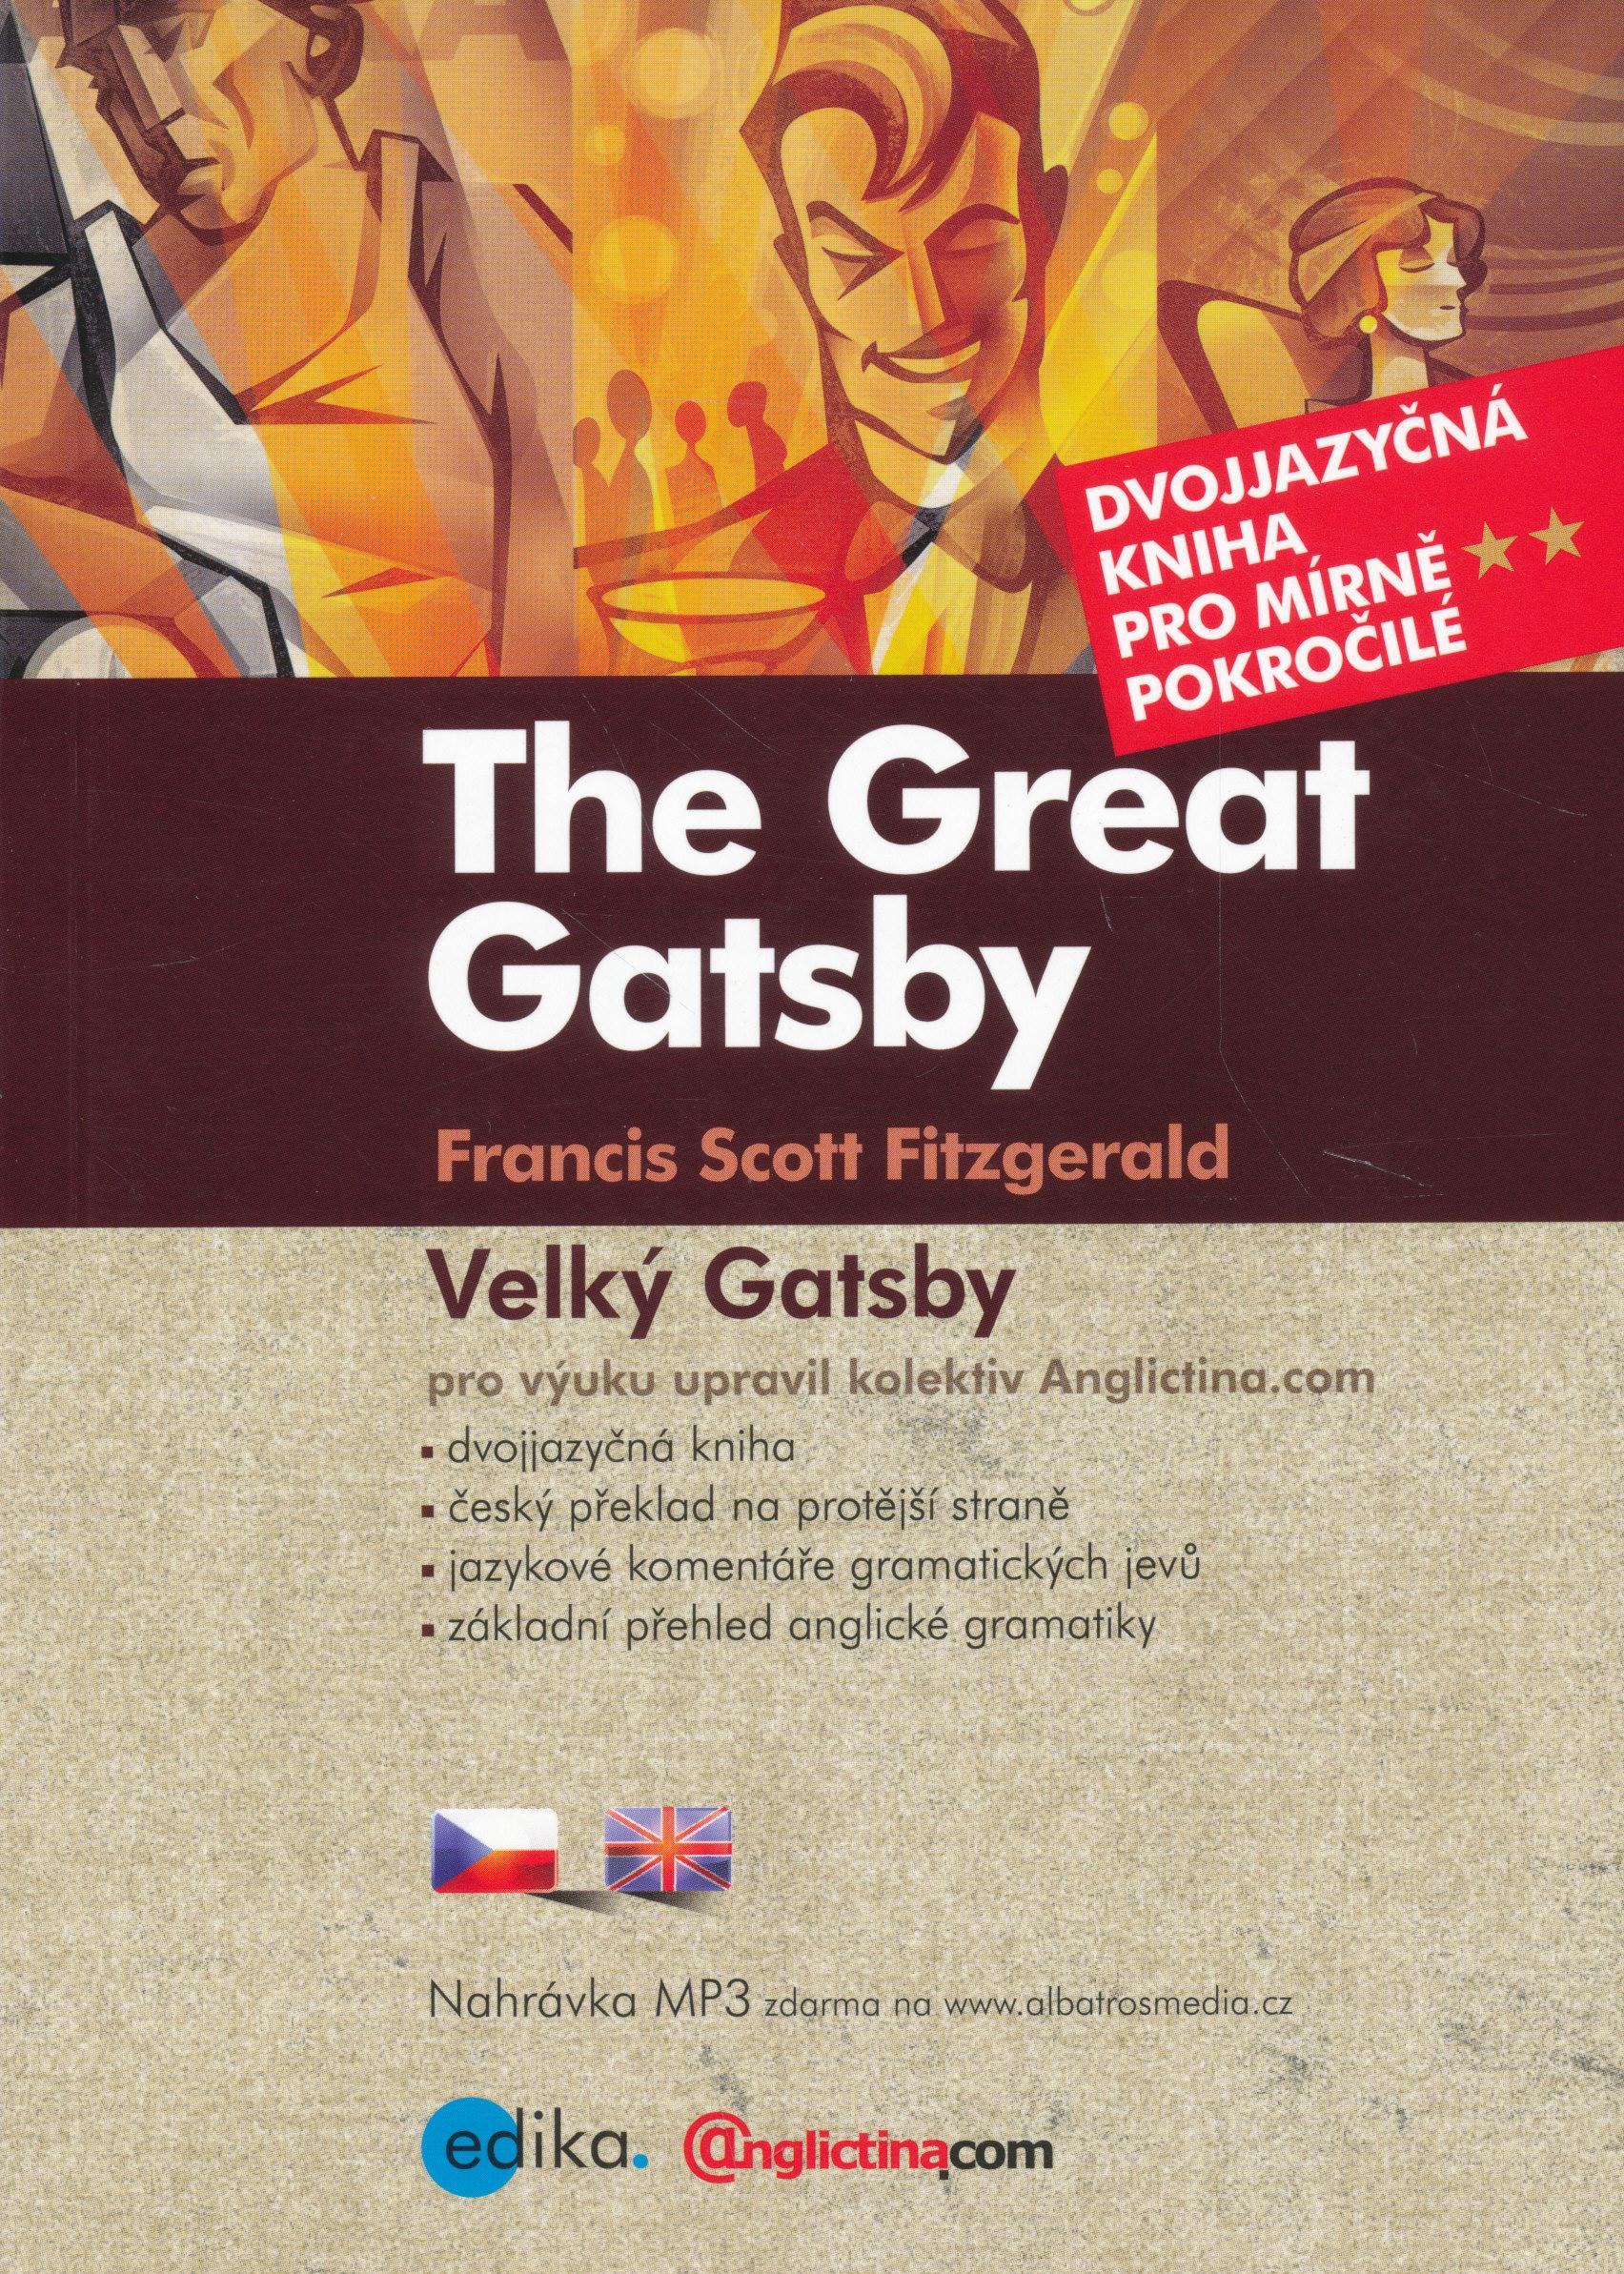 Francis Scott Fitzgerald: Velký Gatsby - Dvojjazyčná kniha + CD MP3